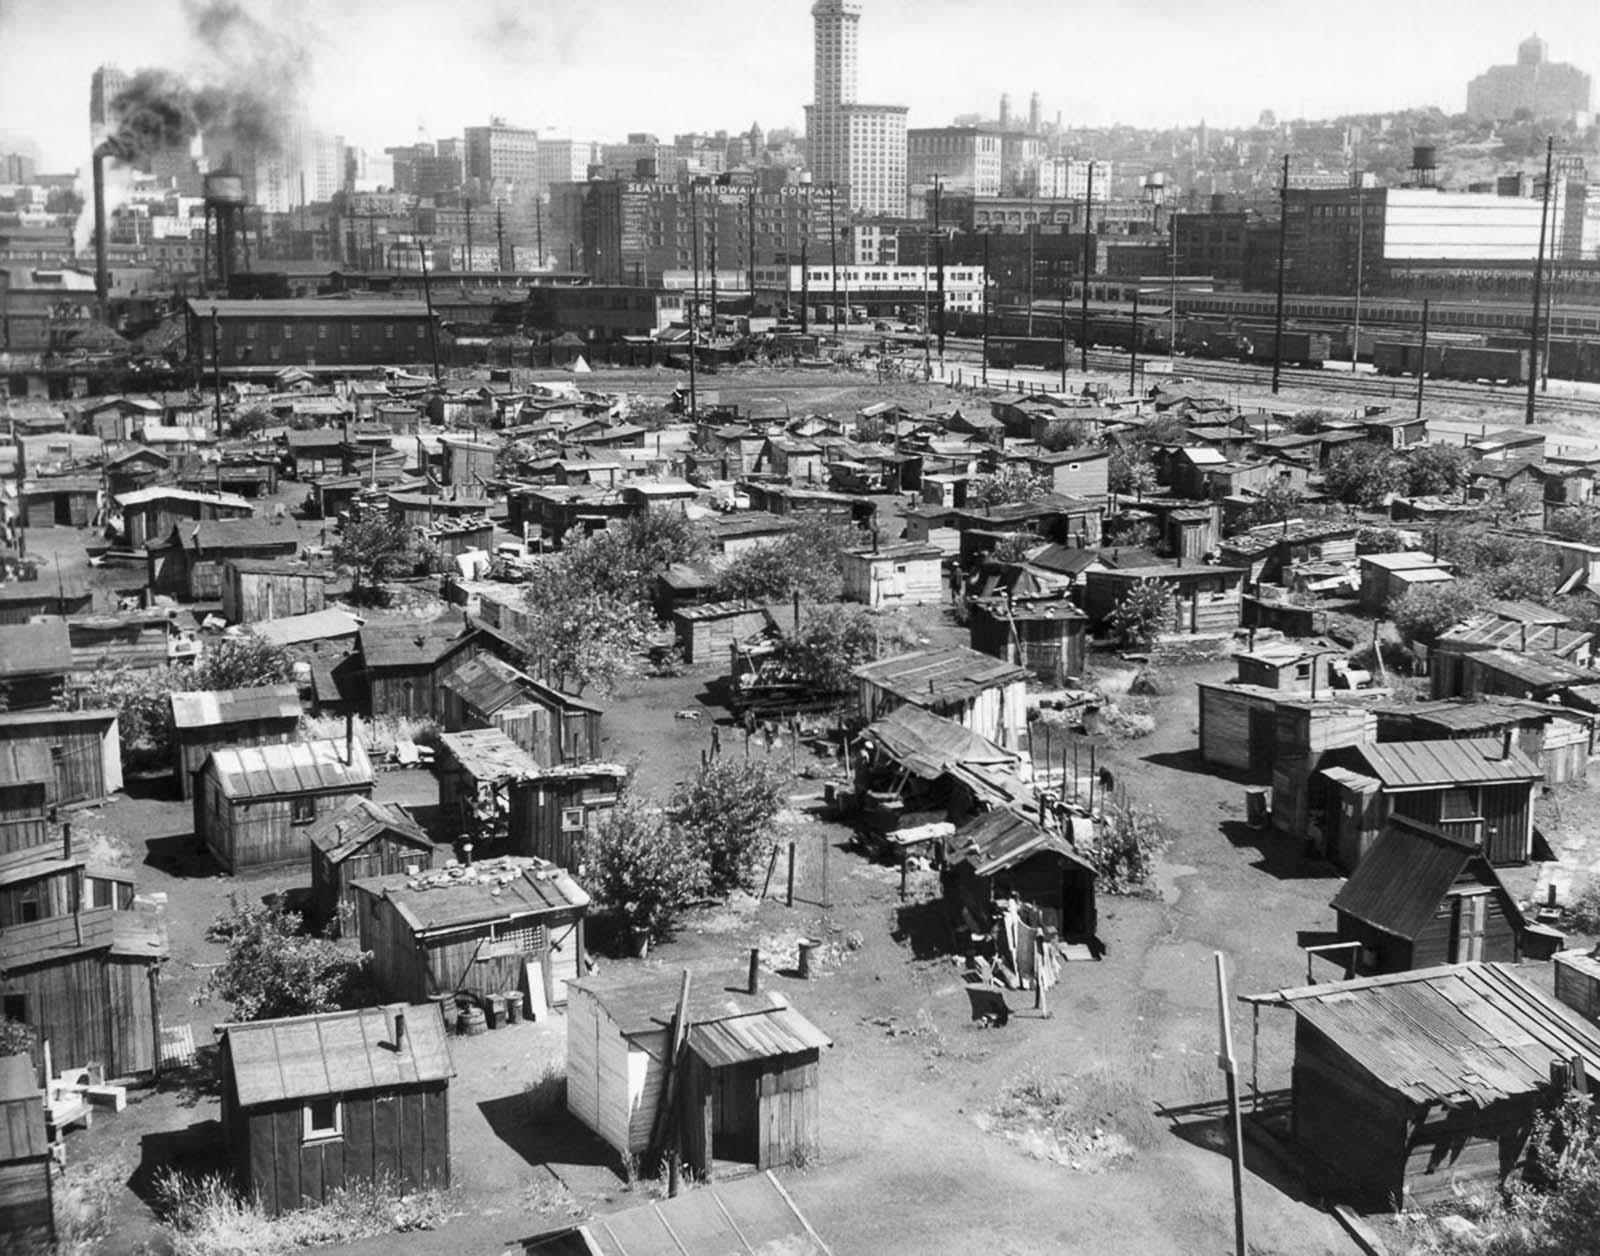 hoovervilles great depression photographs